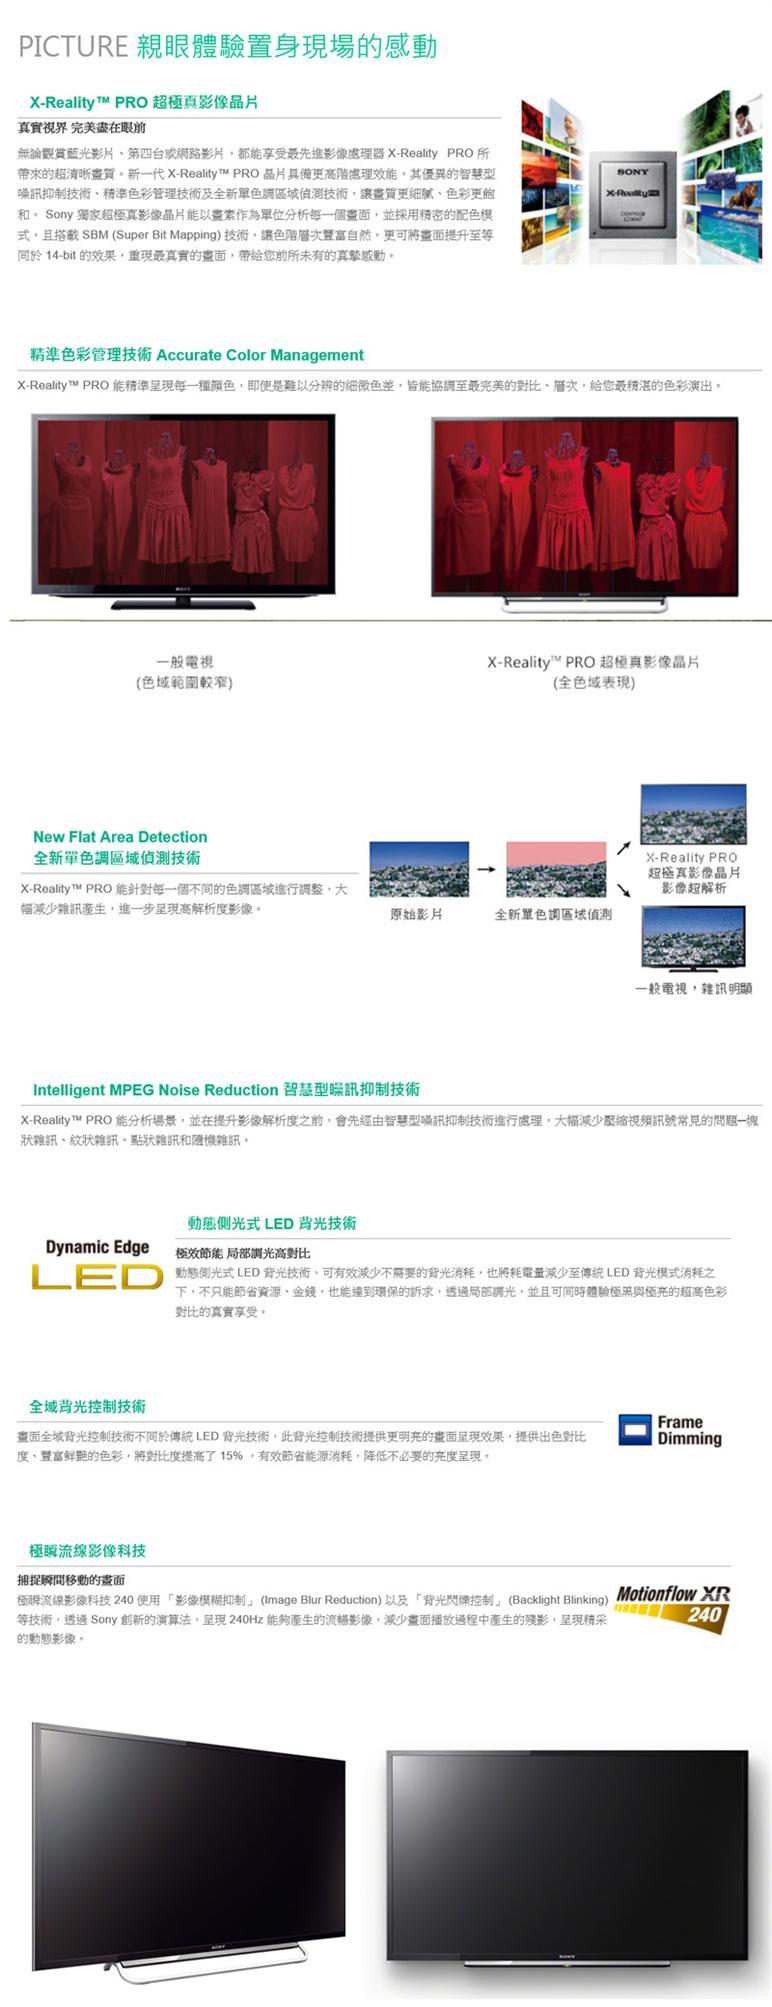 sony 40型 led液晶电视 kdl-40w600b